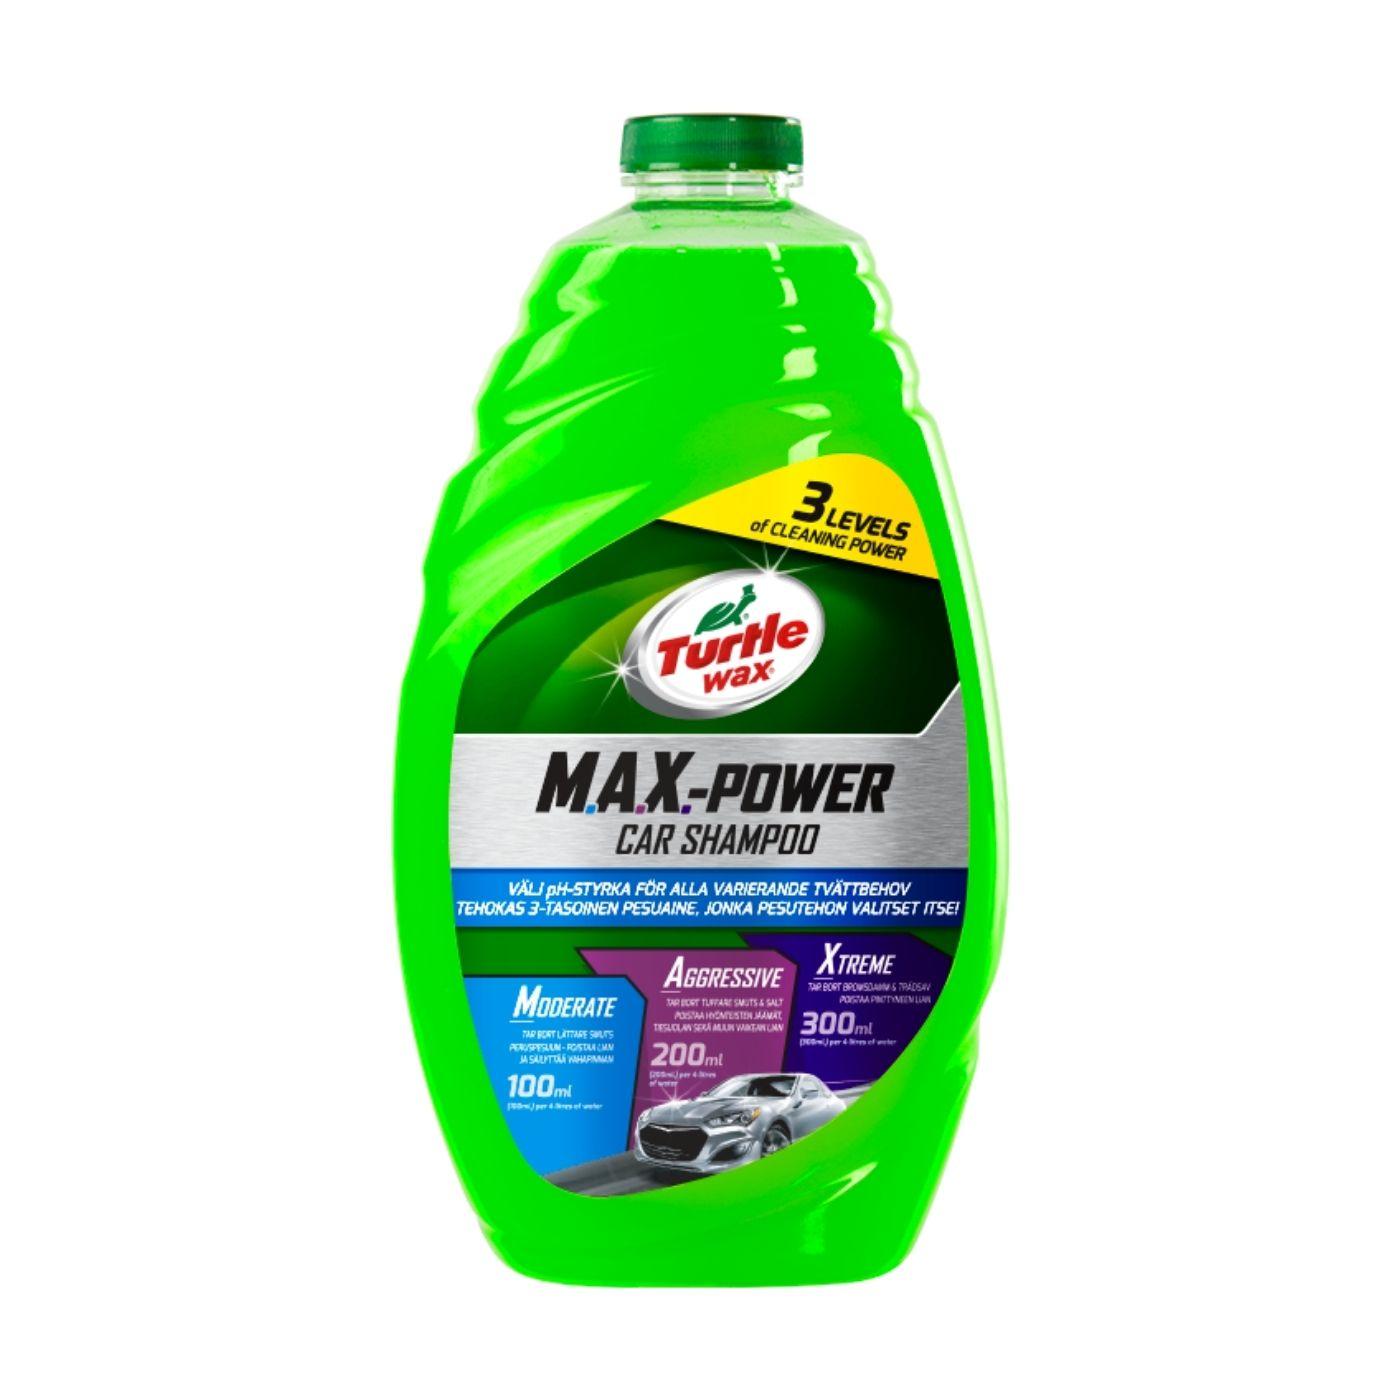 Bilschampo Turtle Wax MAX-POWER Car Shampoo, 1420 ml